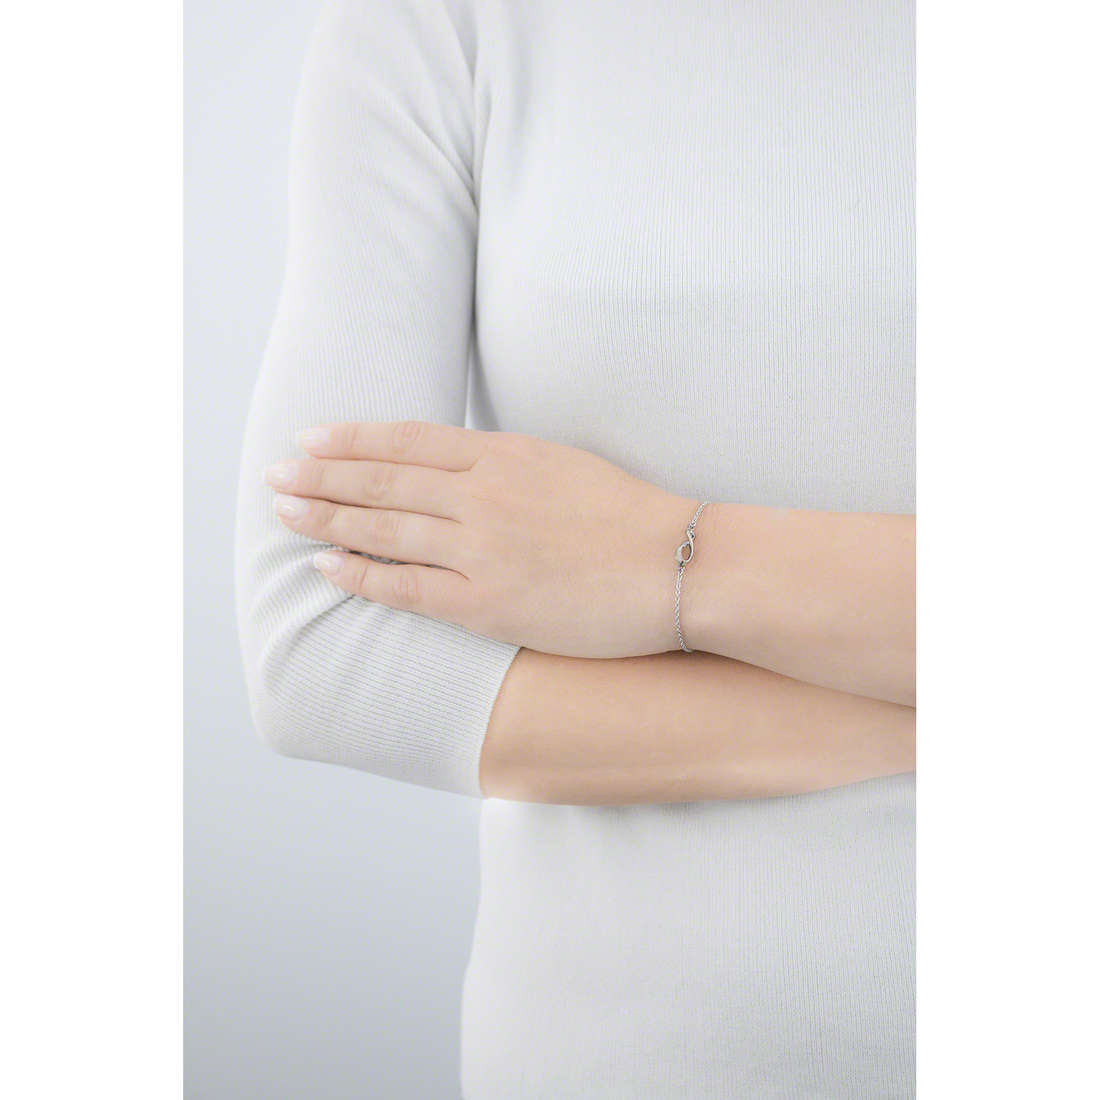 Breil bracelets Small Stories femme TJ1785 indosso